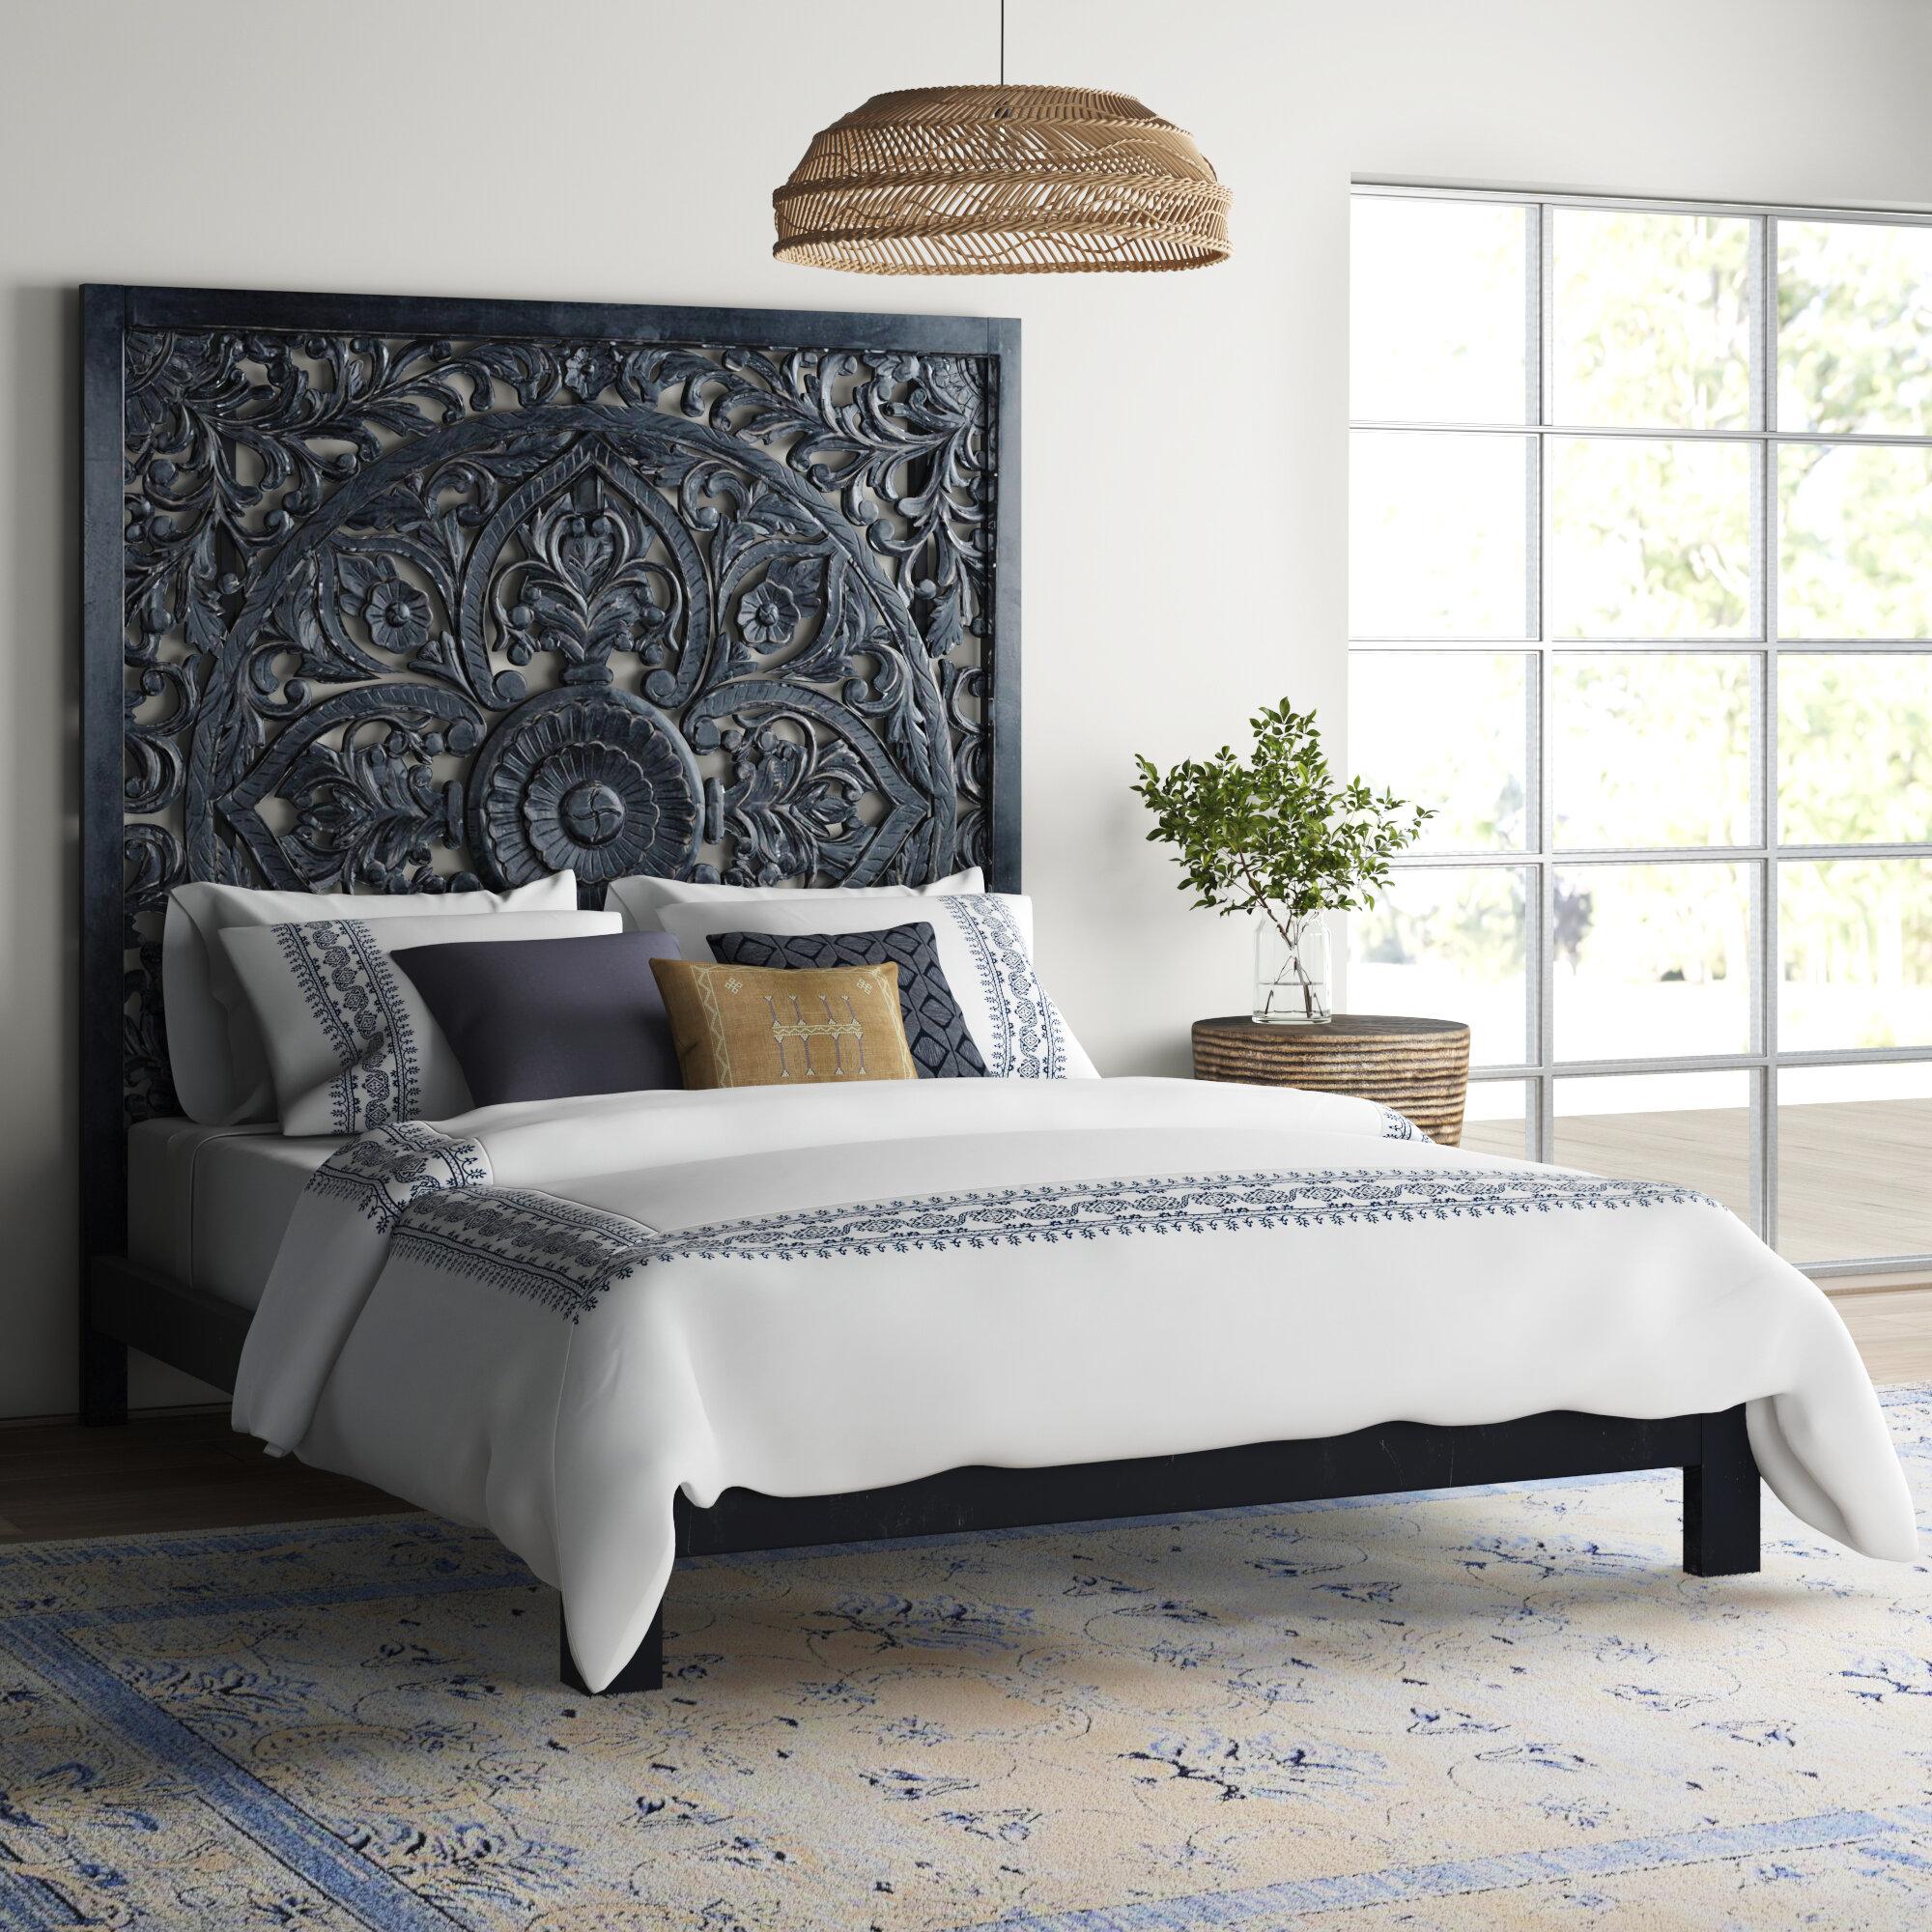 Bungalow Rose Corder Queen Solid Wood Platform Bed Reviews Wayfair